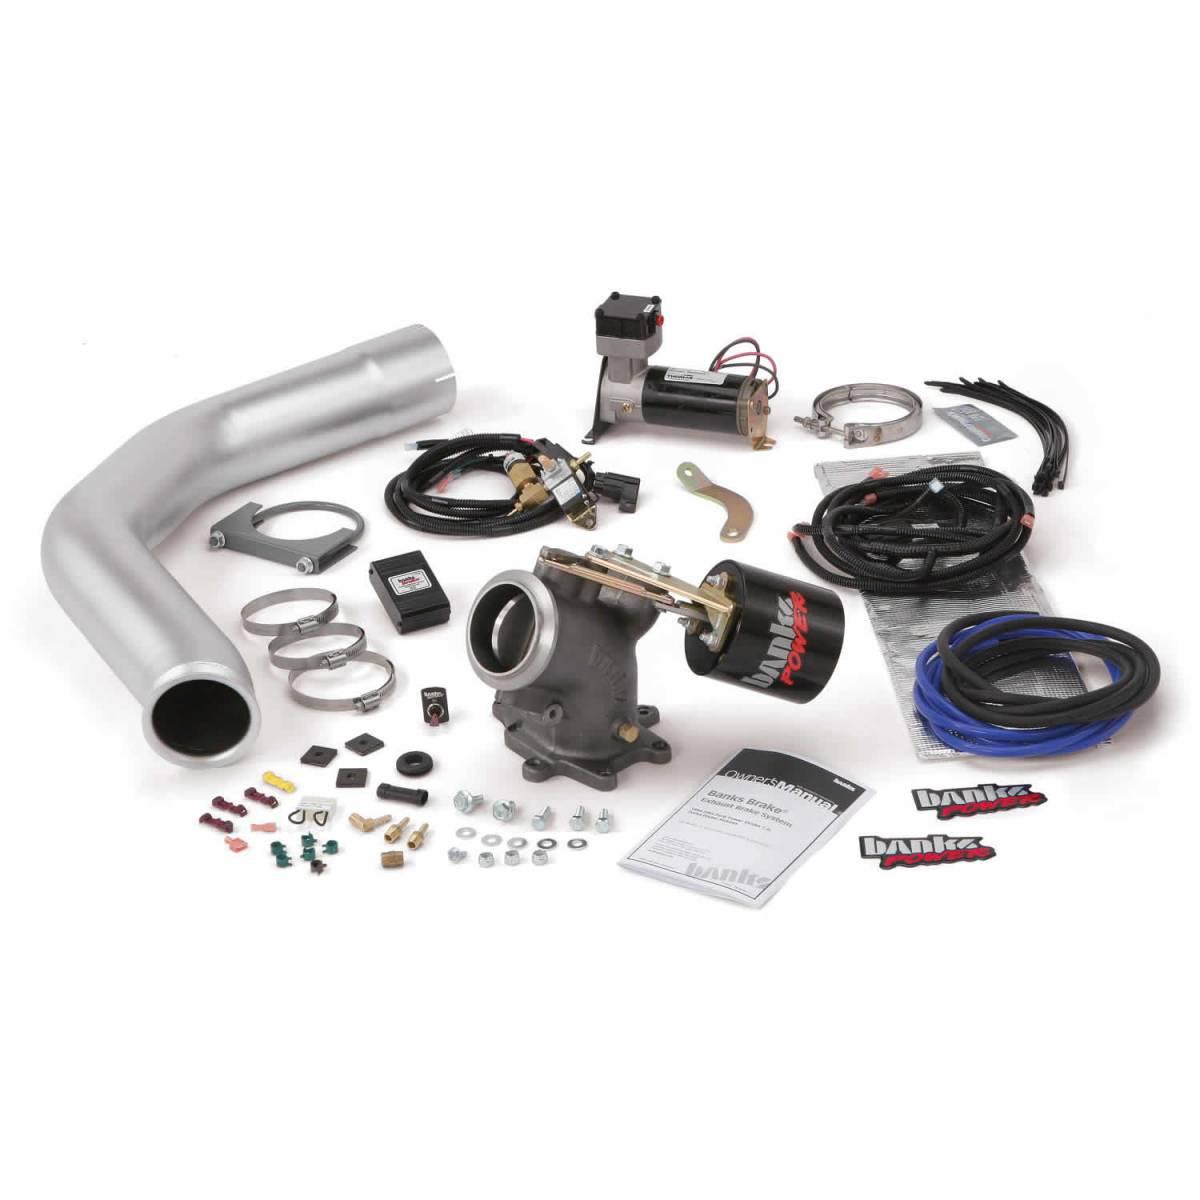 banks power brake exhaust braking system 99 99 5 ford 7 3l stock exhaust